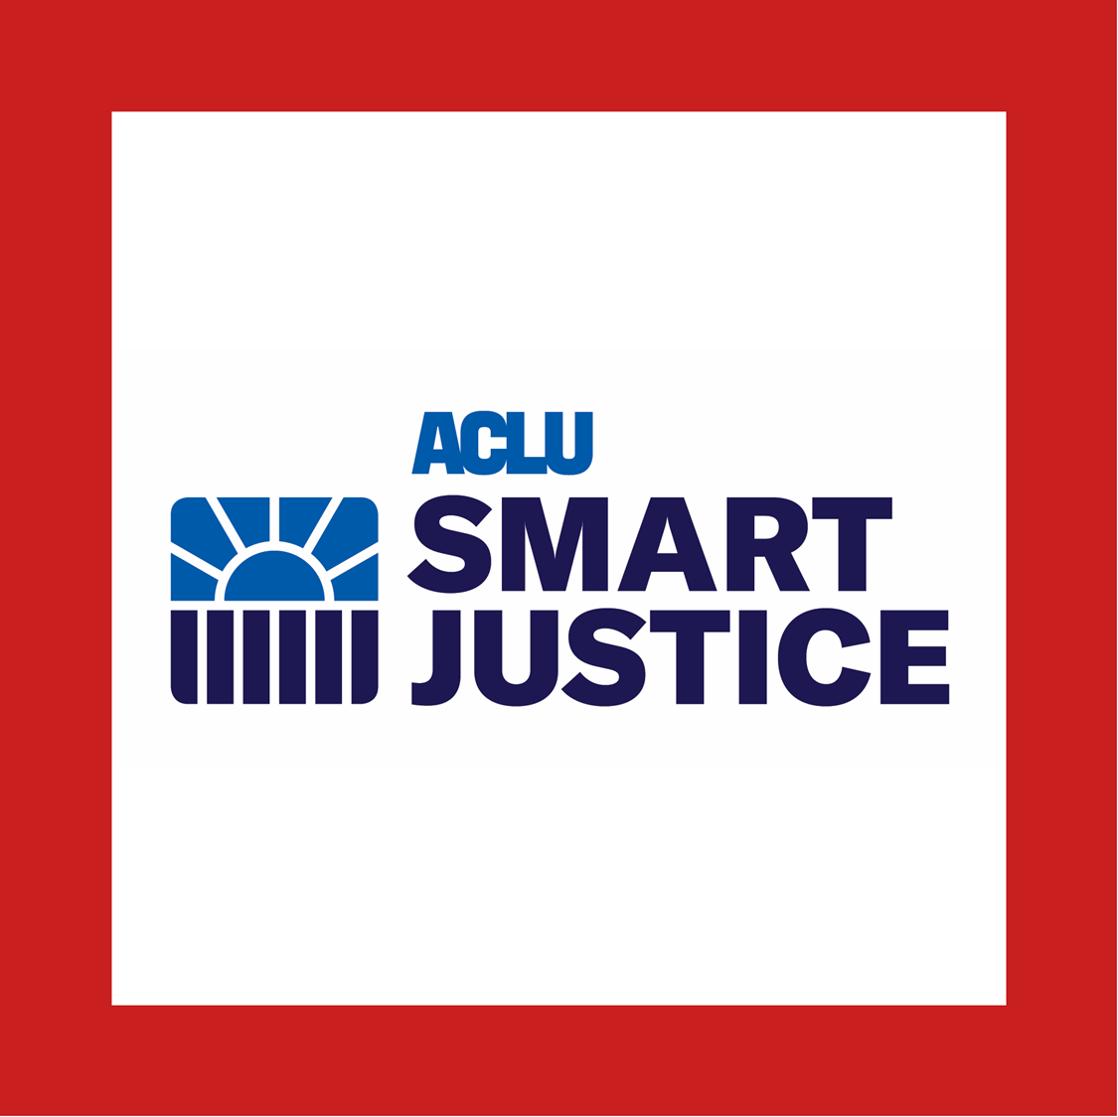 ACLU2.png